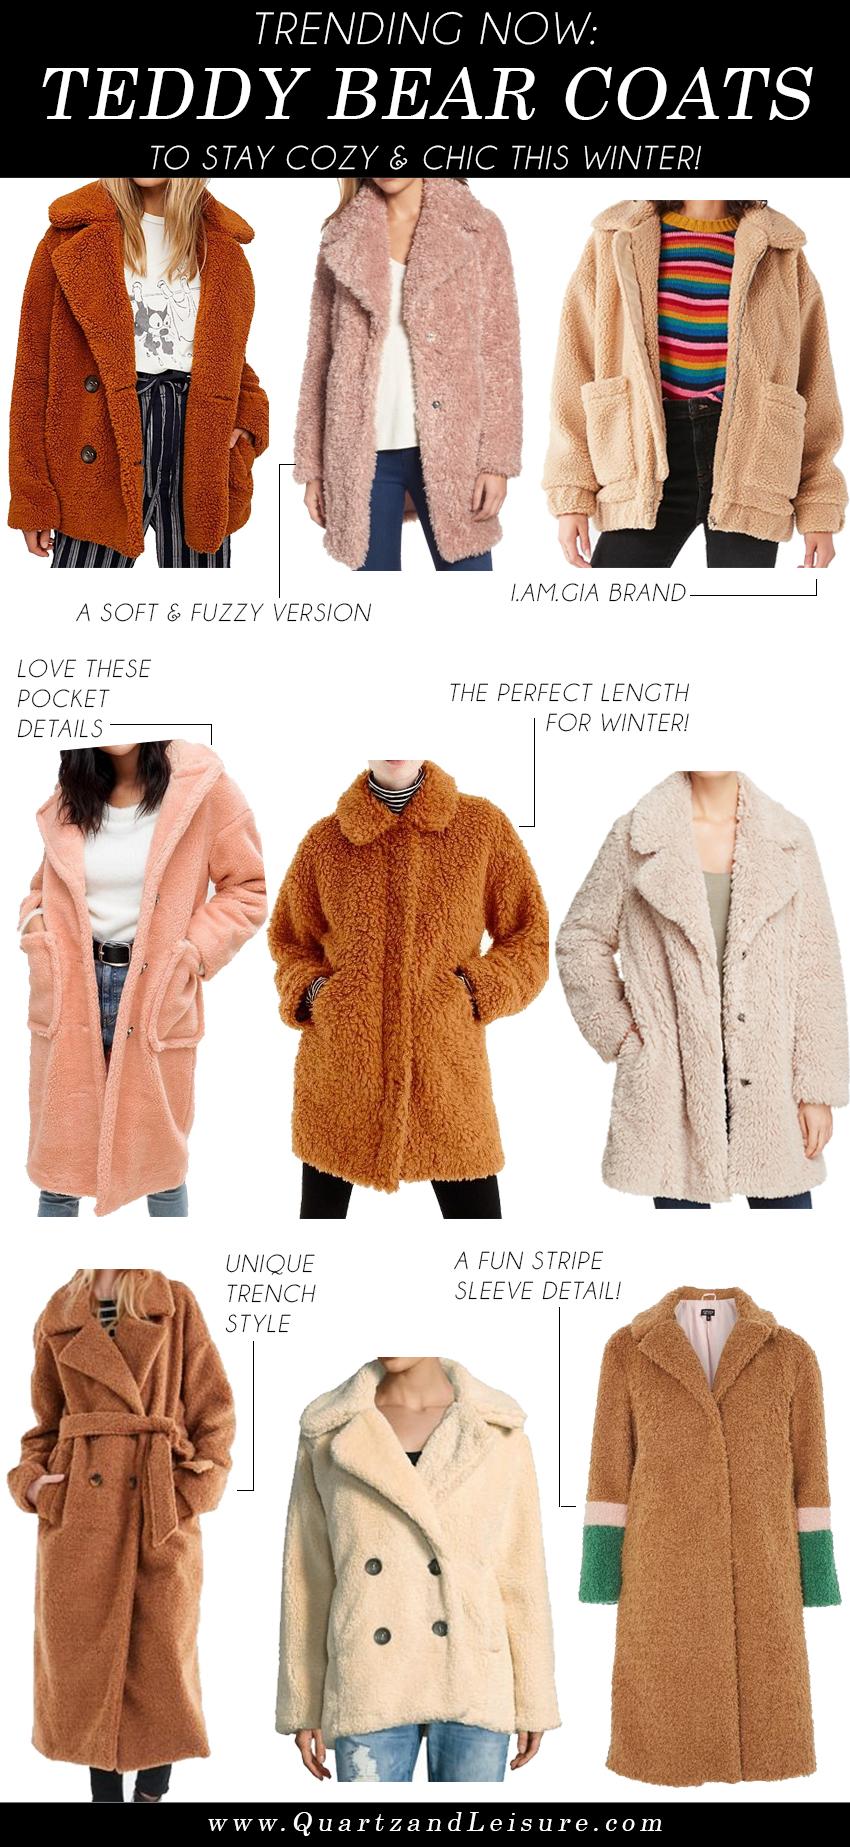 Teddy Bear Coats, Teddy Coat, Teddy Bear Jacket Urban Outfitters, Free People